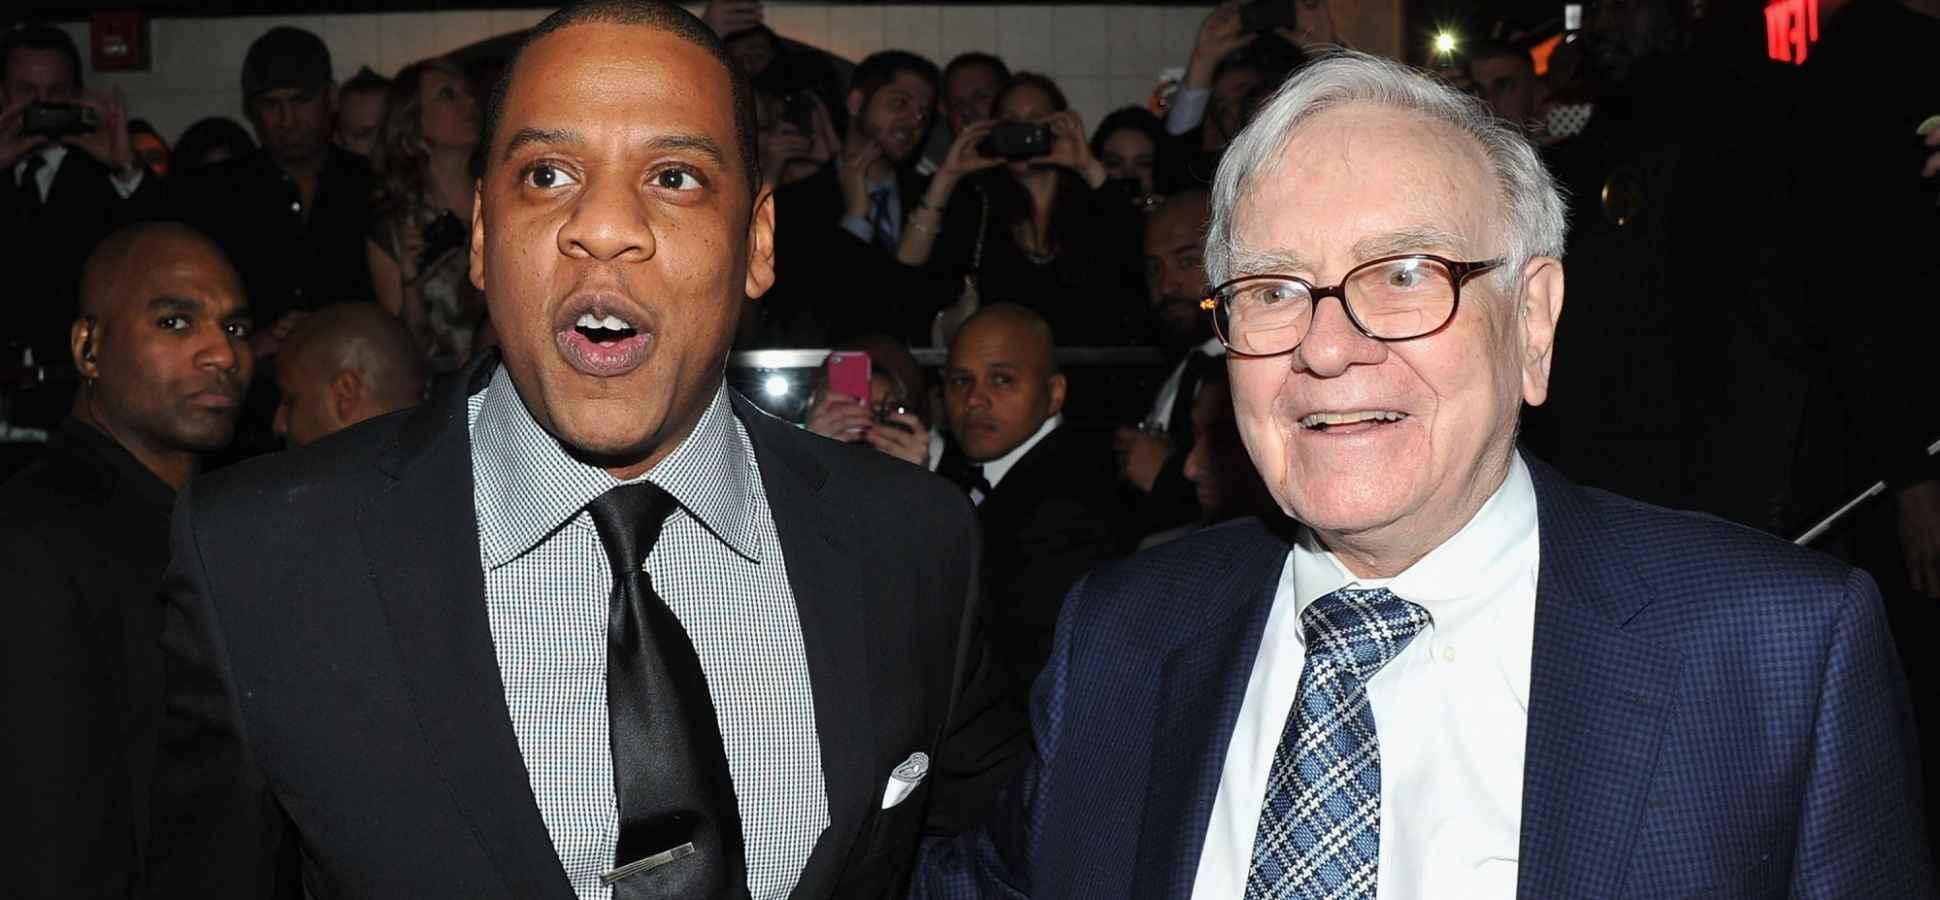 Warren Buffett Increased His Wealth 7,268% Using This 1 Method